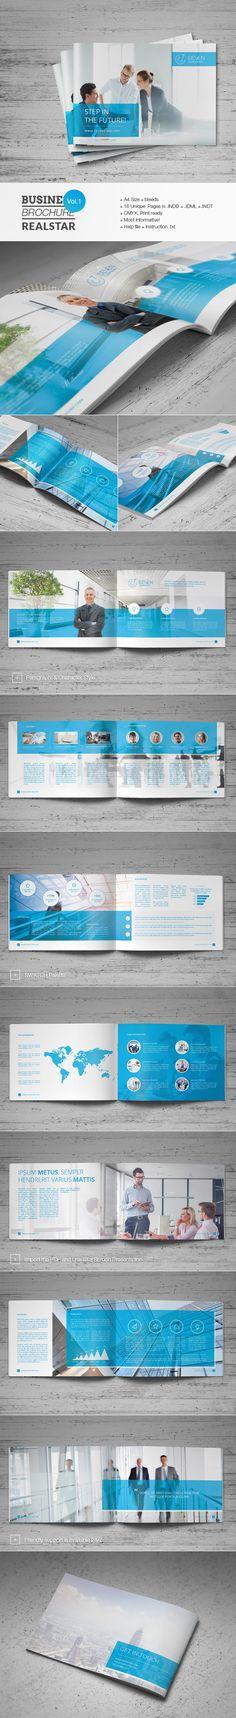 Business Brochure Vol.1 by Realstar, via Behance